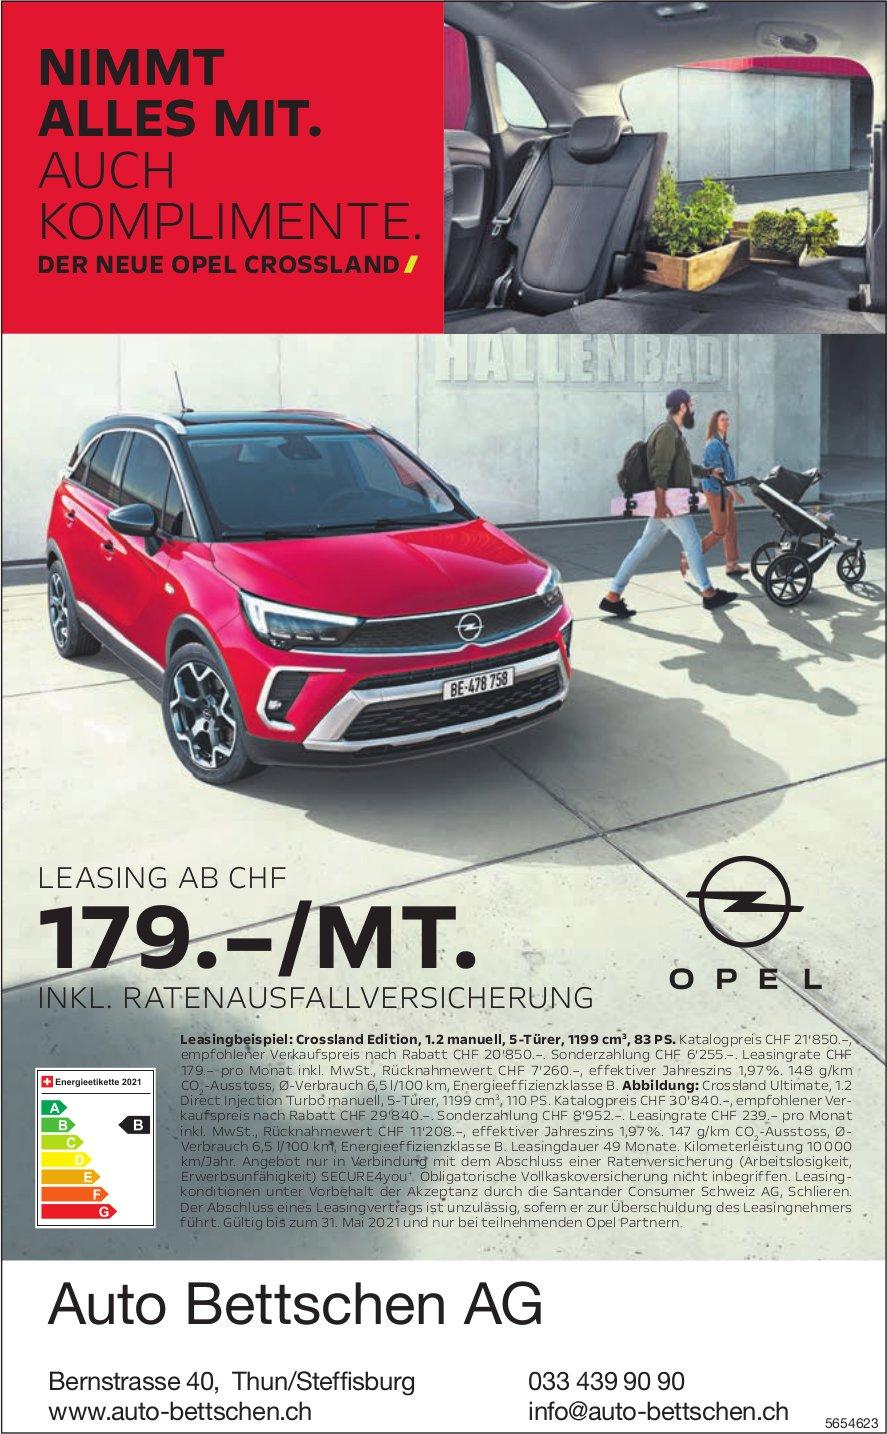 Auto Bettschen AG, Thun/Steffisburg - Der Neue Opel Crossland